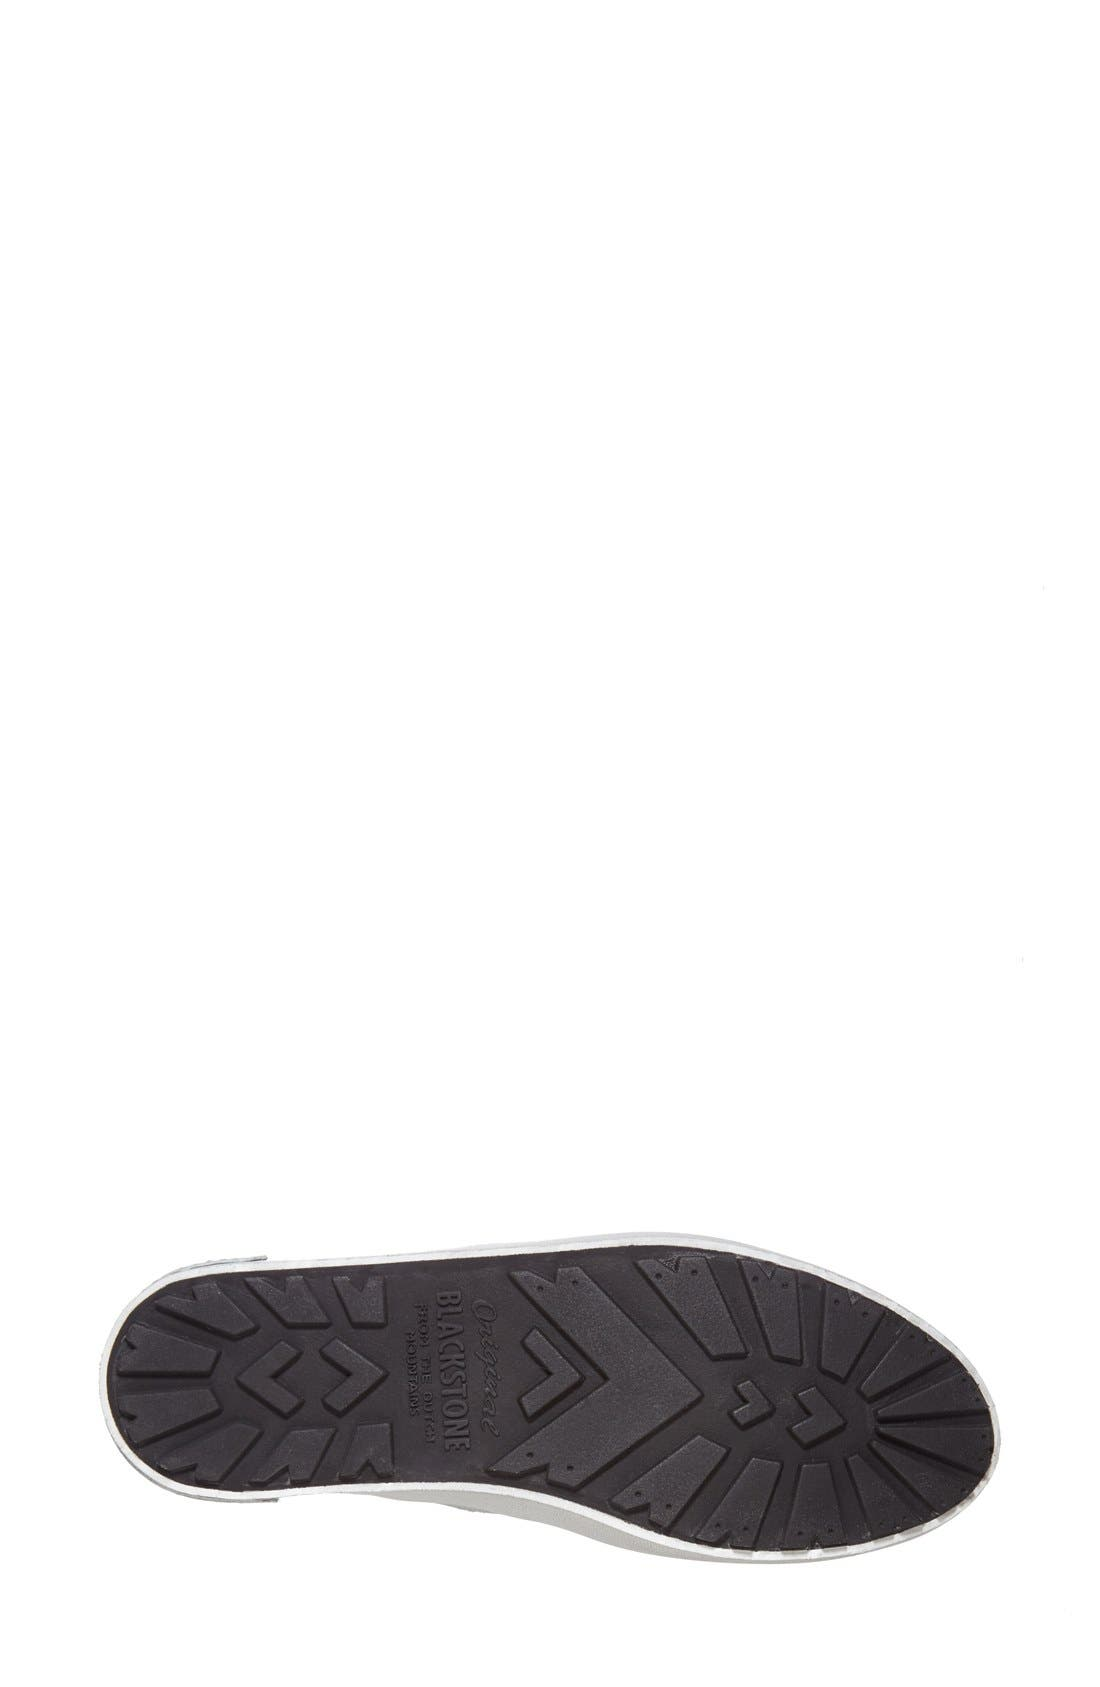 Alternate Image 4  - Blackstone 'JL23' Slip-On Sneaker (Women)